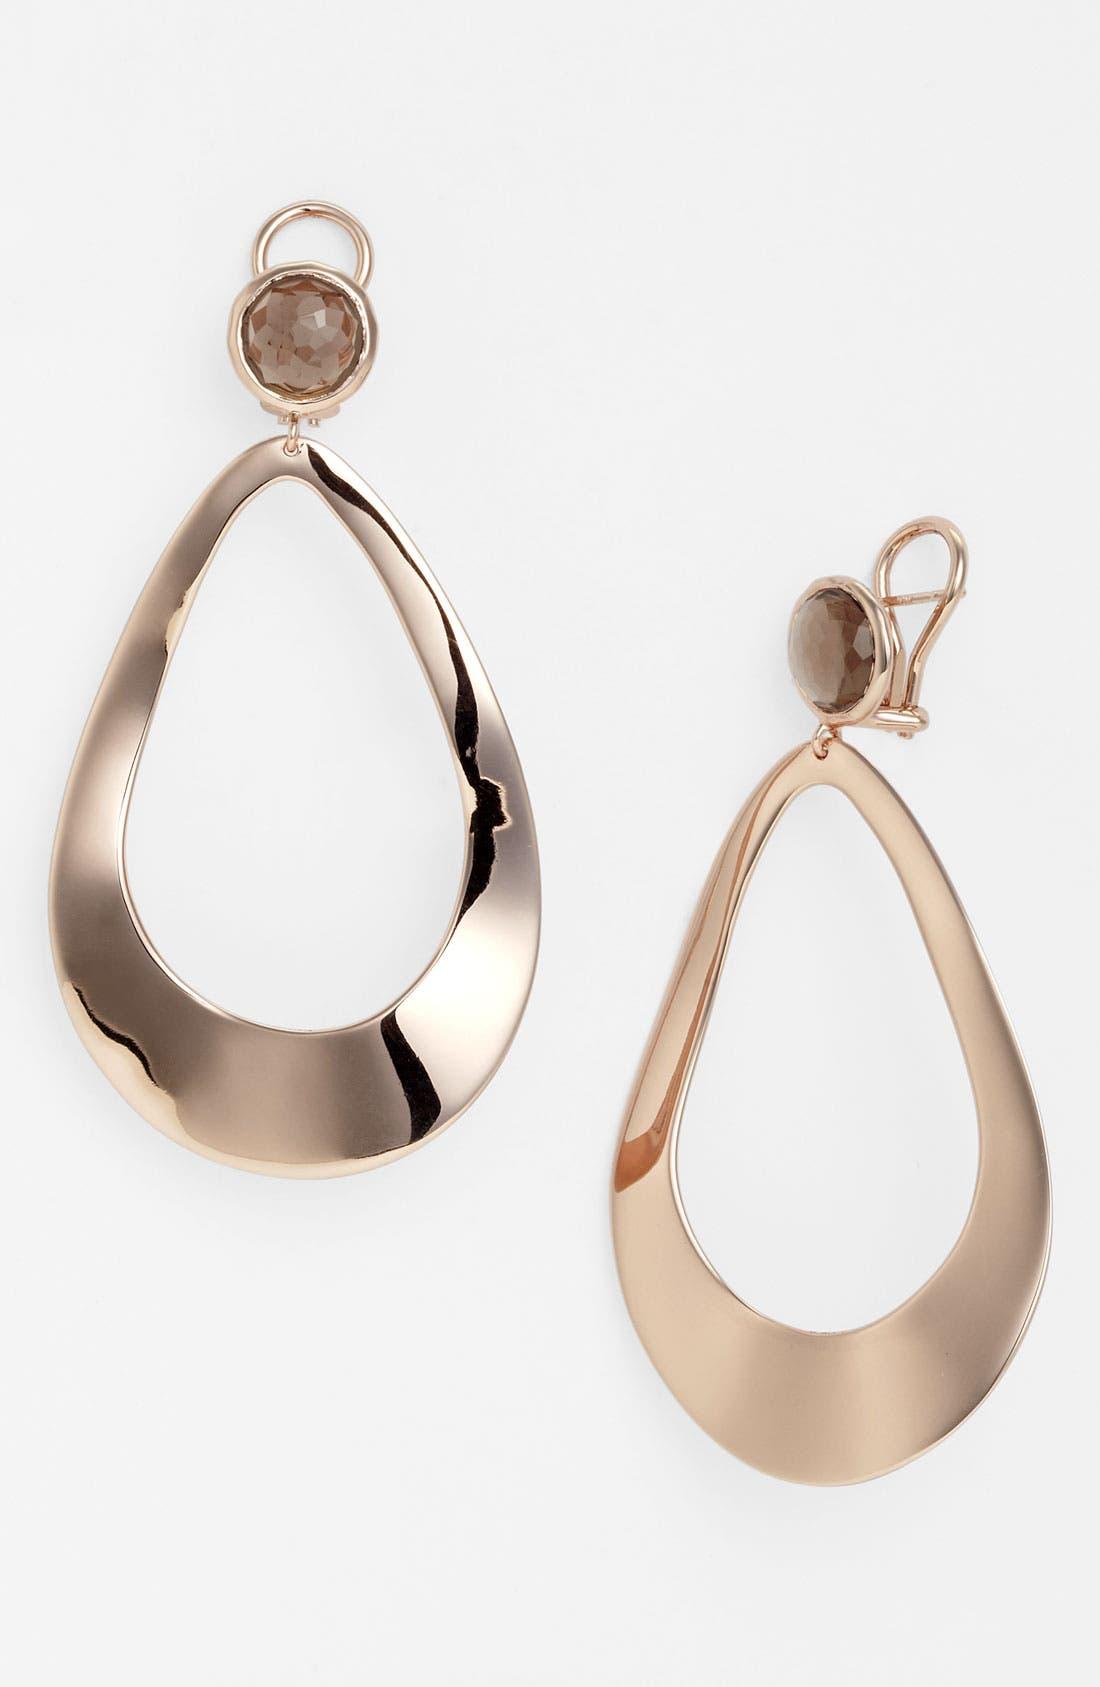 Main Image - Ippolita 'Lite Links - Snowman' Open Statement Earrings